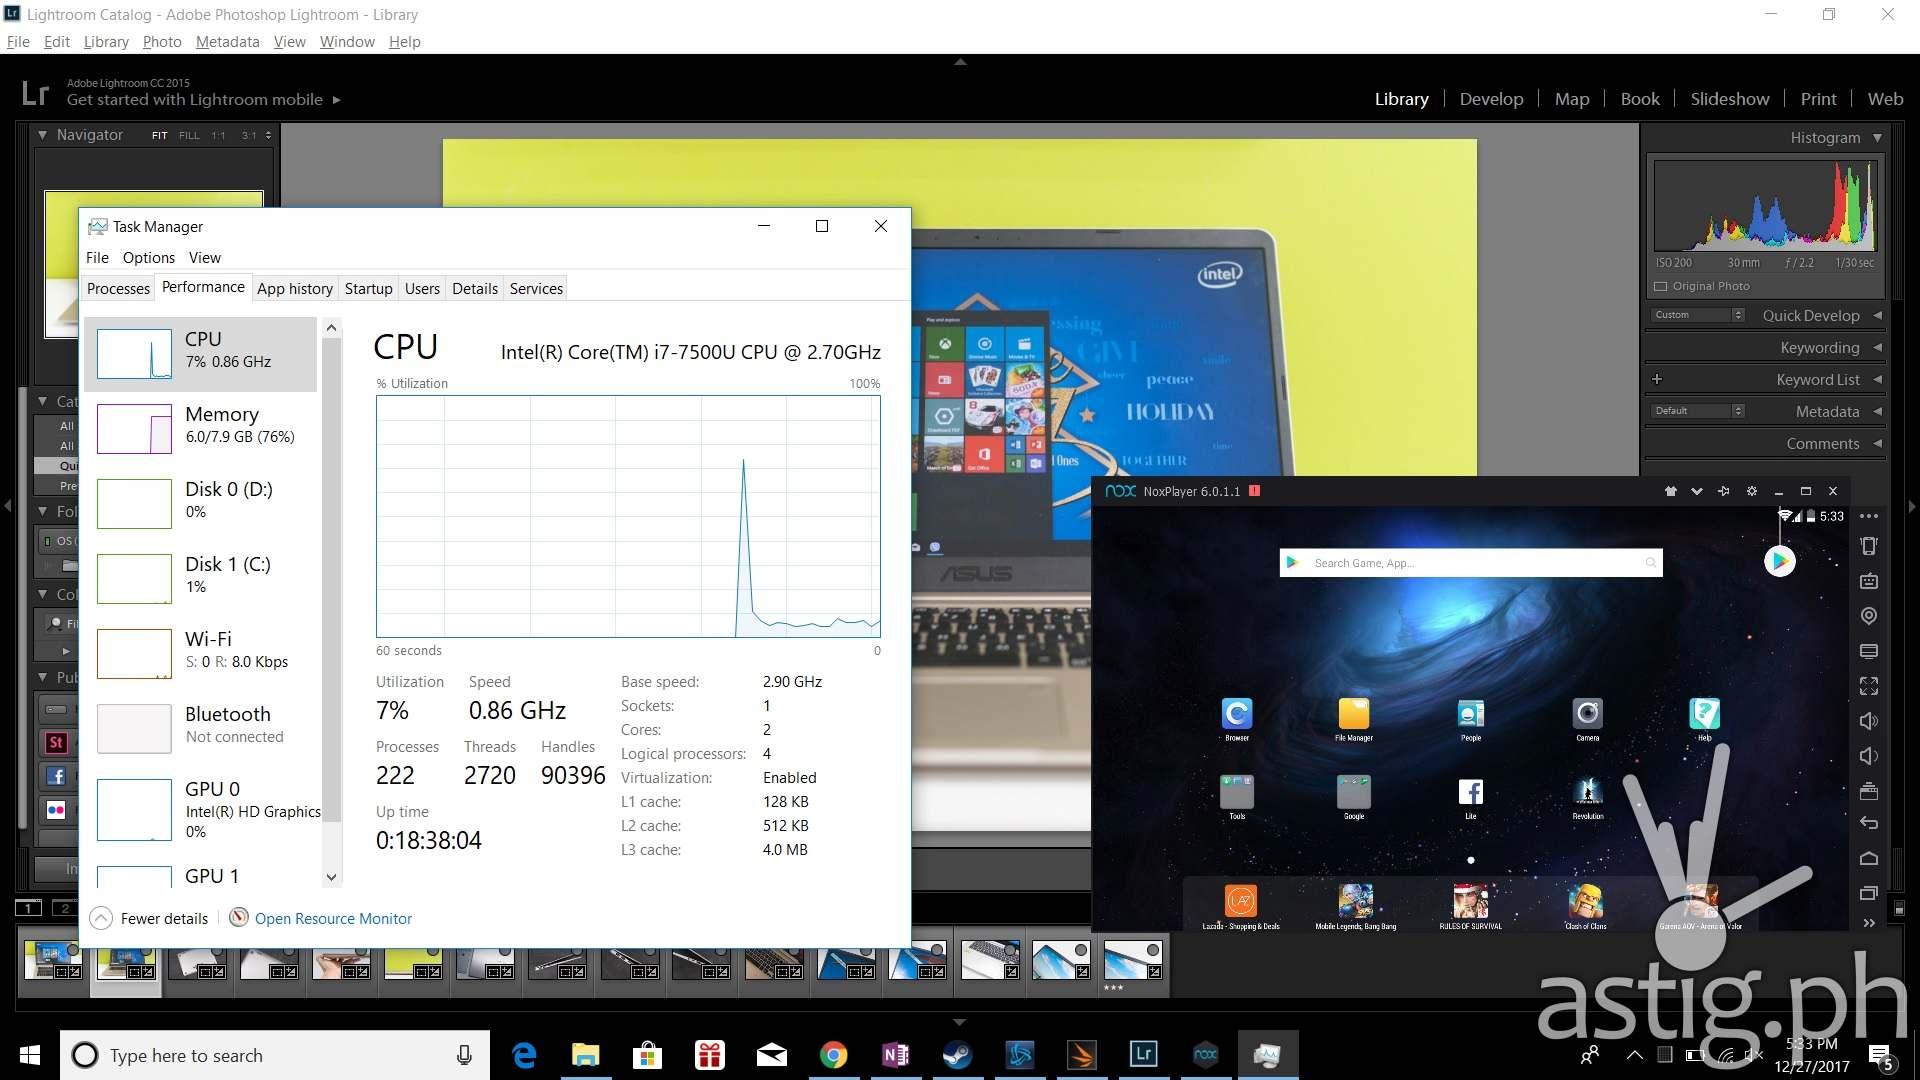 Resource utilization while running Lightroom, Nox, Steam, 3D Mark, Battle.Net and Chrome - ASUS VivoBook S15